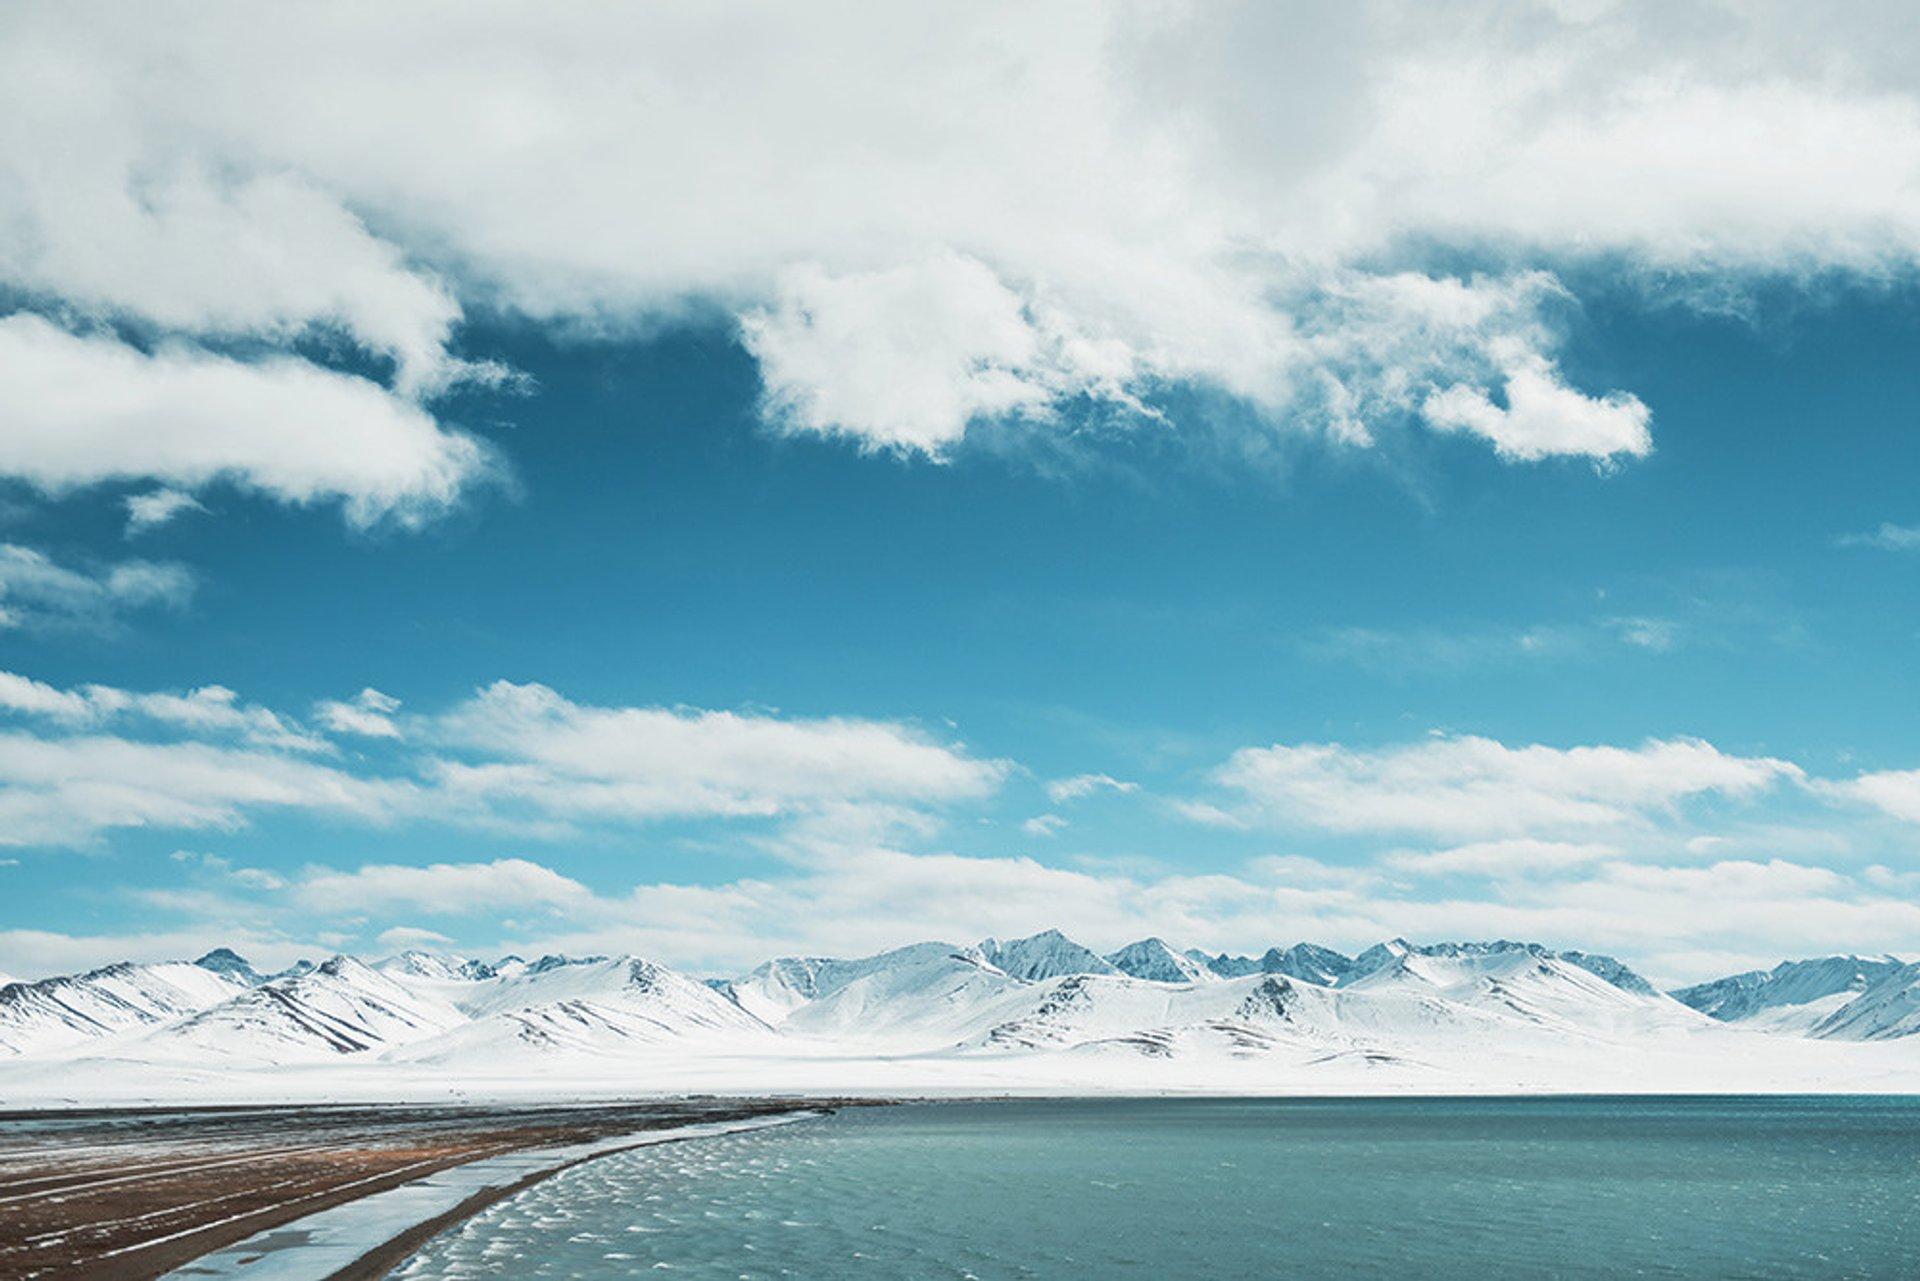 Namtso lake, Tibet 2020